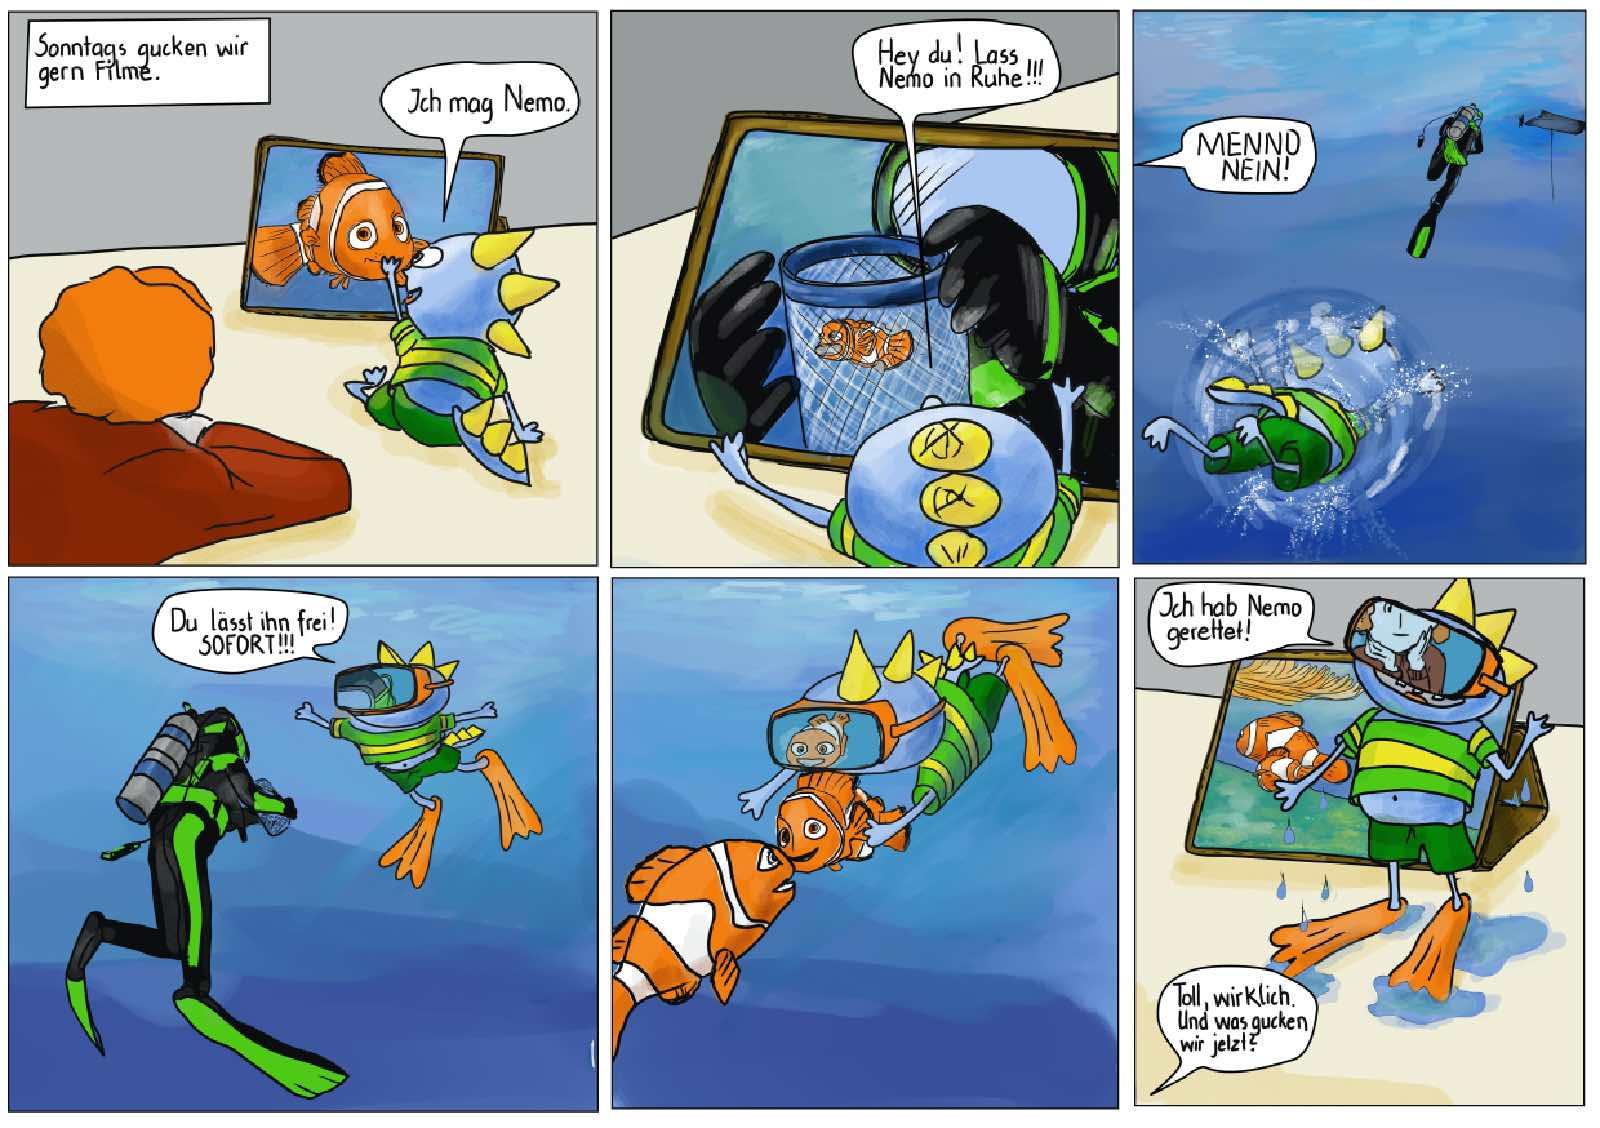 Menno rettet Nemo